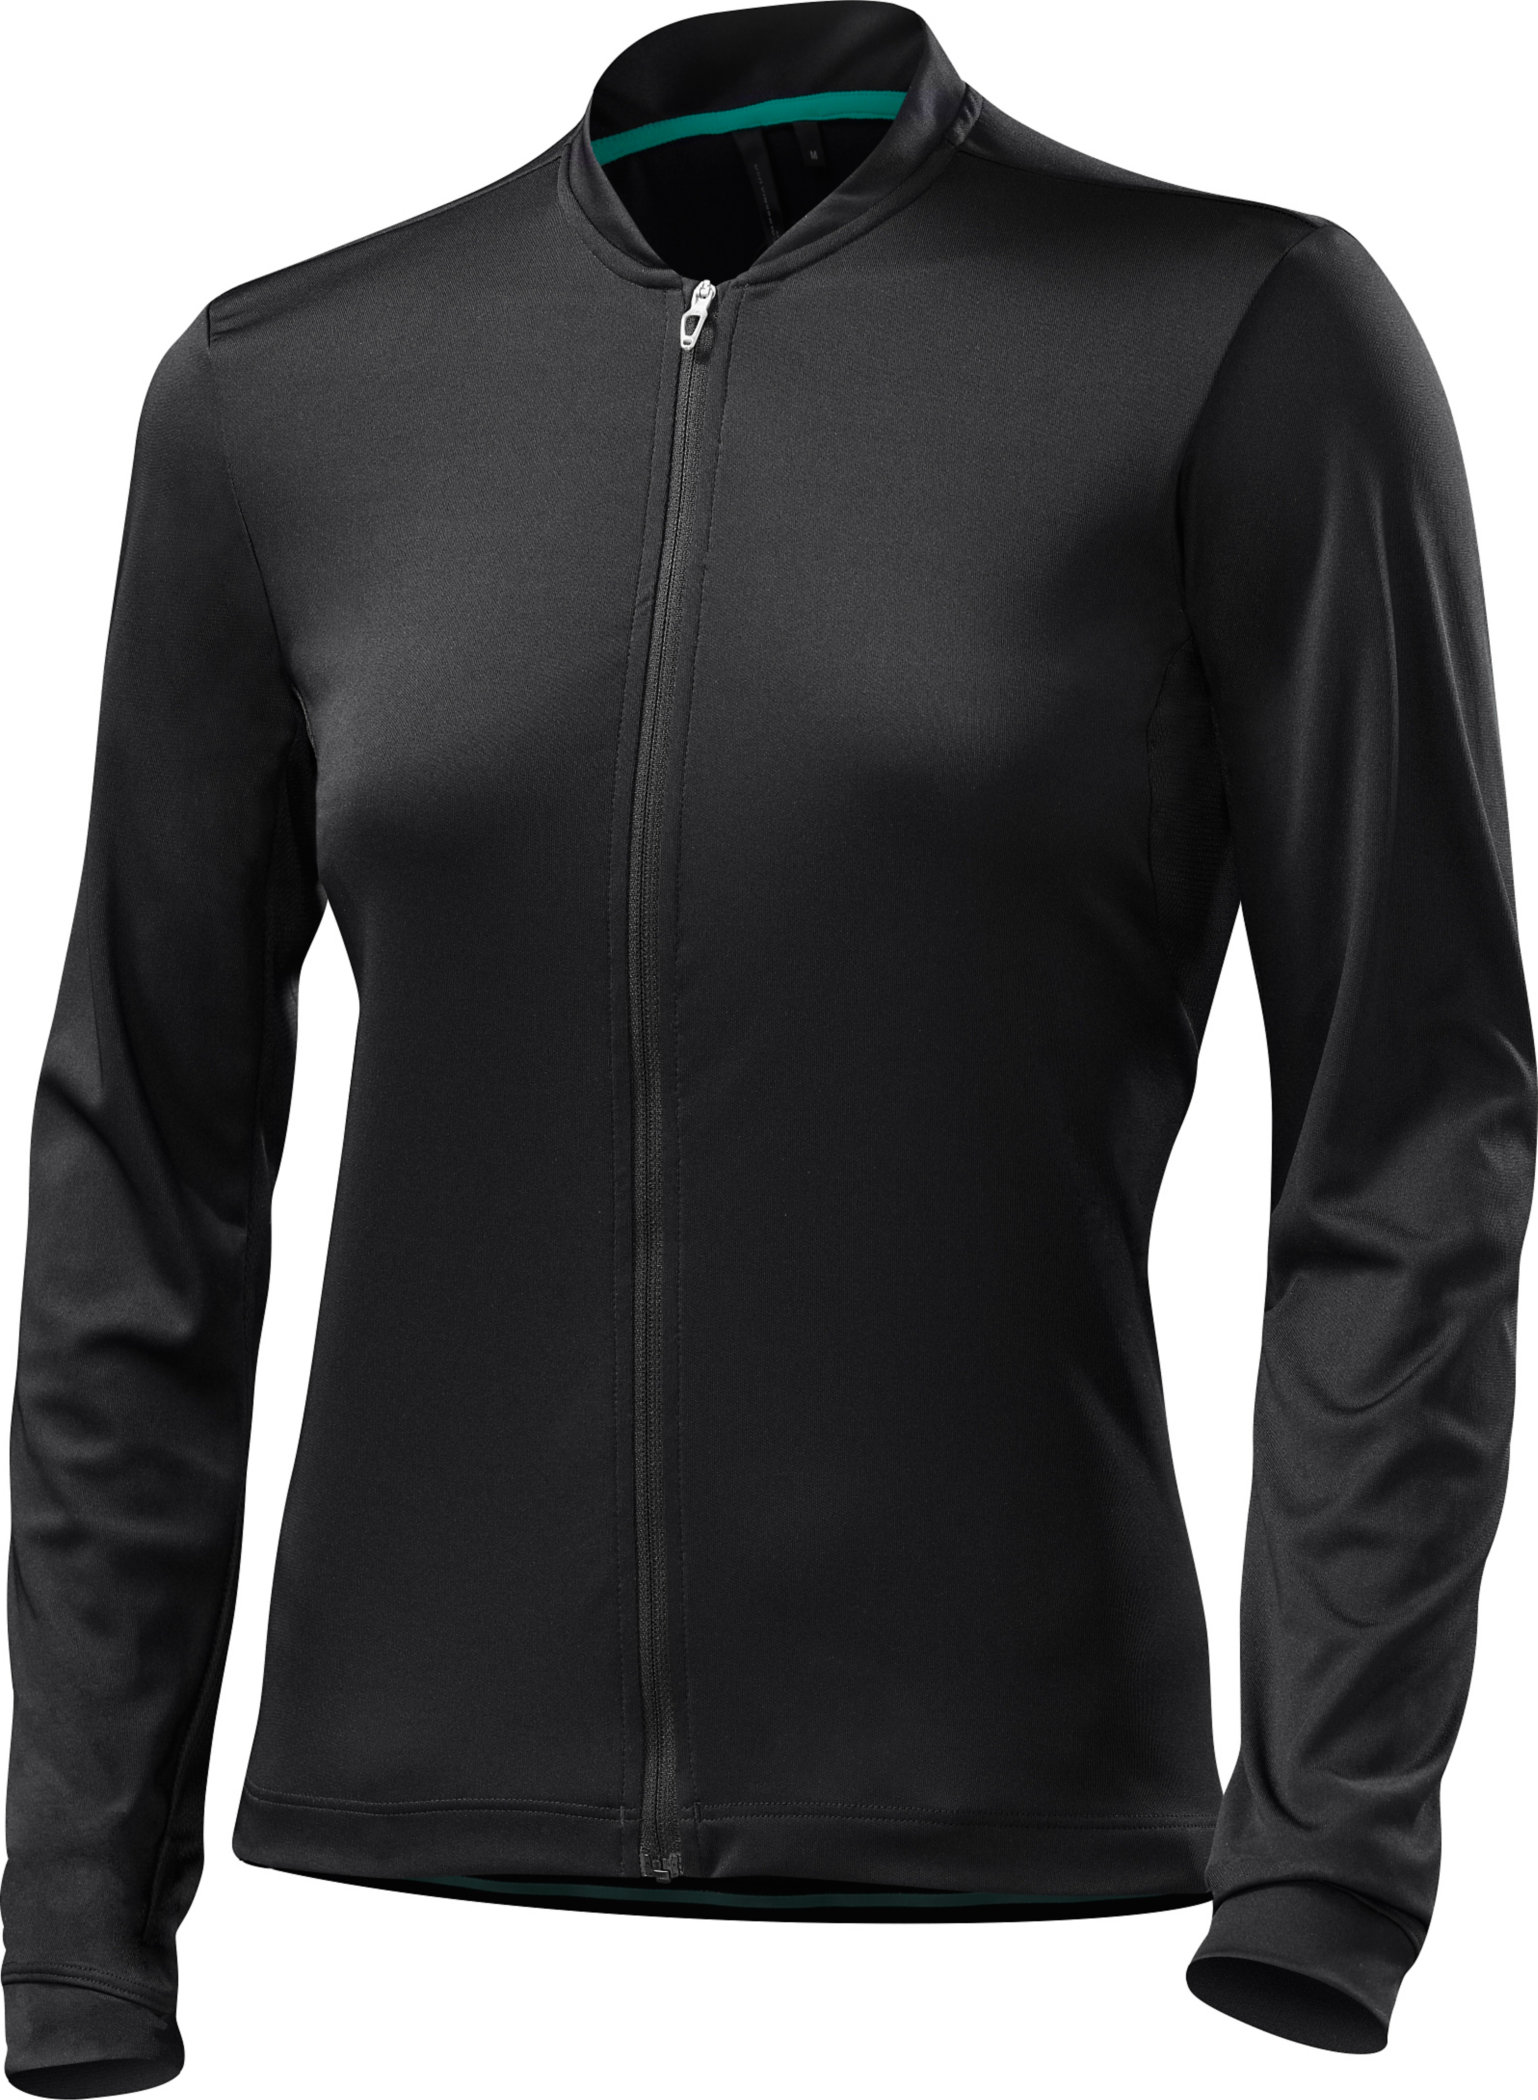 Specialized Women´s RBX Sport Long Sleeve Jersey Black Large - Alpha Bikes